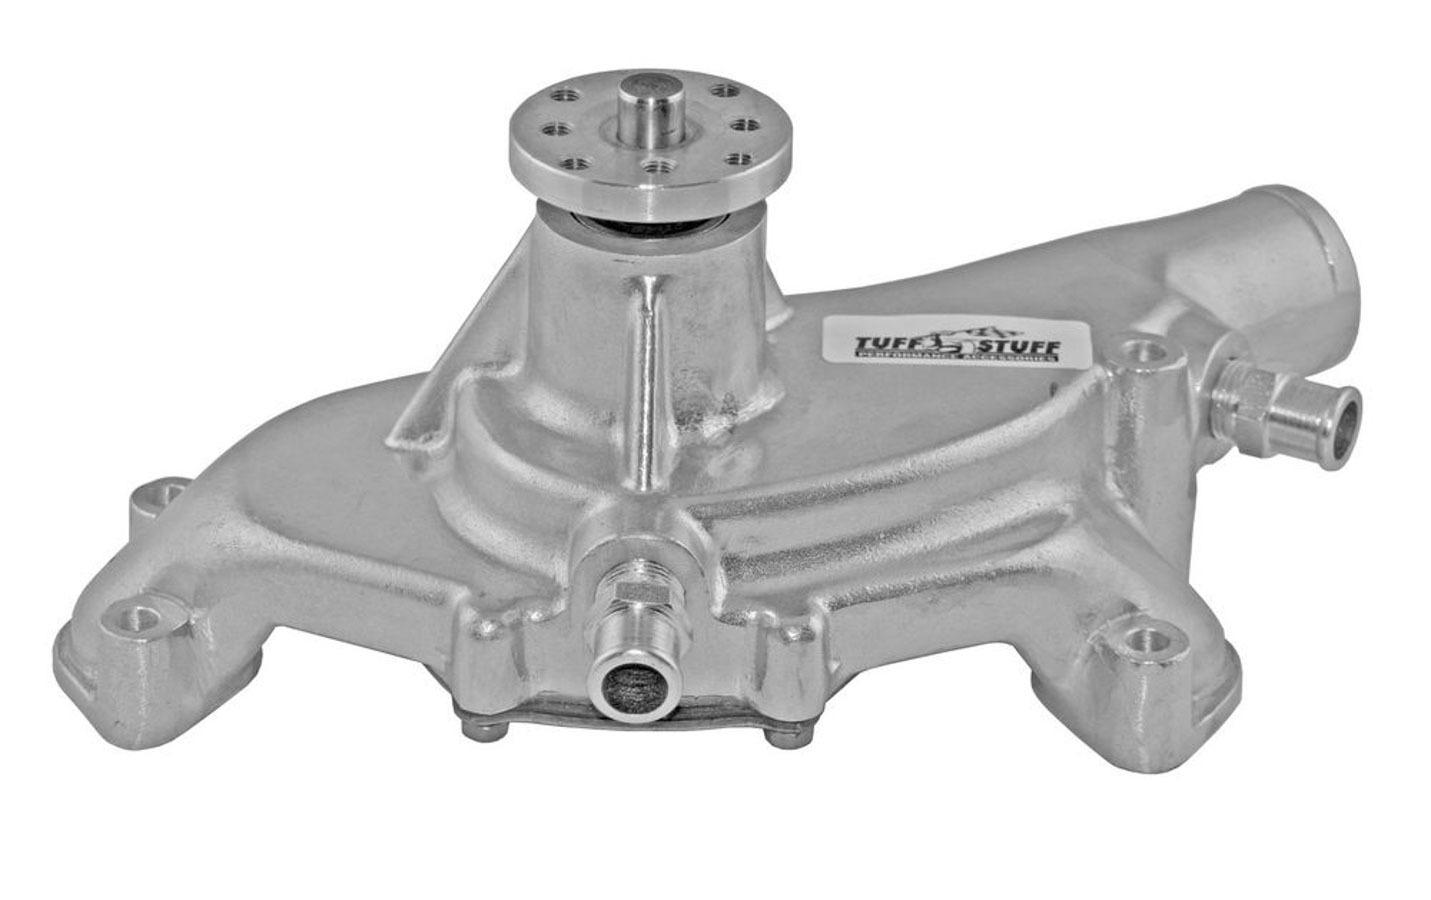 Tuff-Stuff 1495AC Water Pump, Mechanical, Platinum Series, High Volume, Short Design, Aluminum, Natural, Big Block Chevy, Each